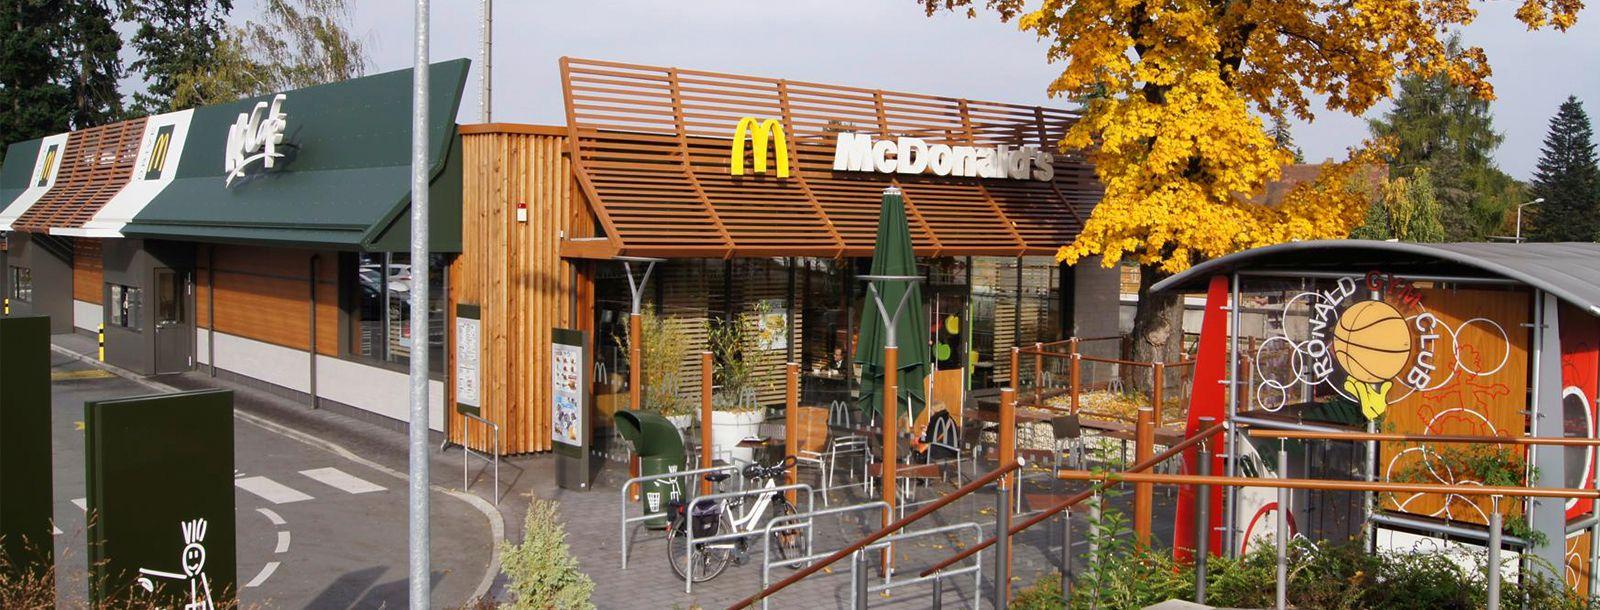 Frth_Unterfarrnbacher-Strasse_1_McDonalds